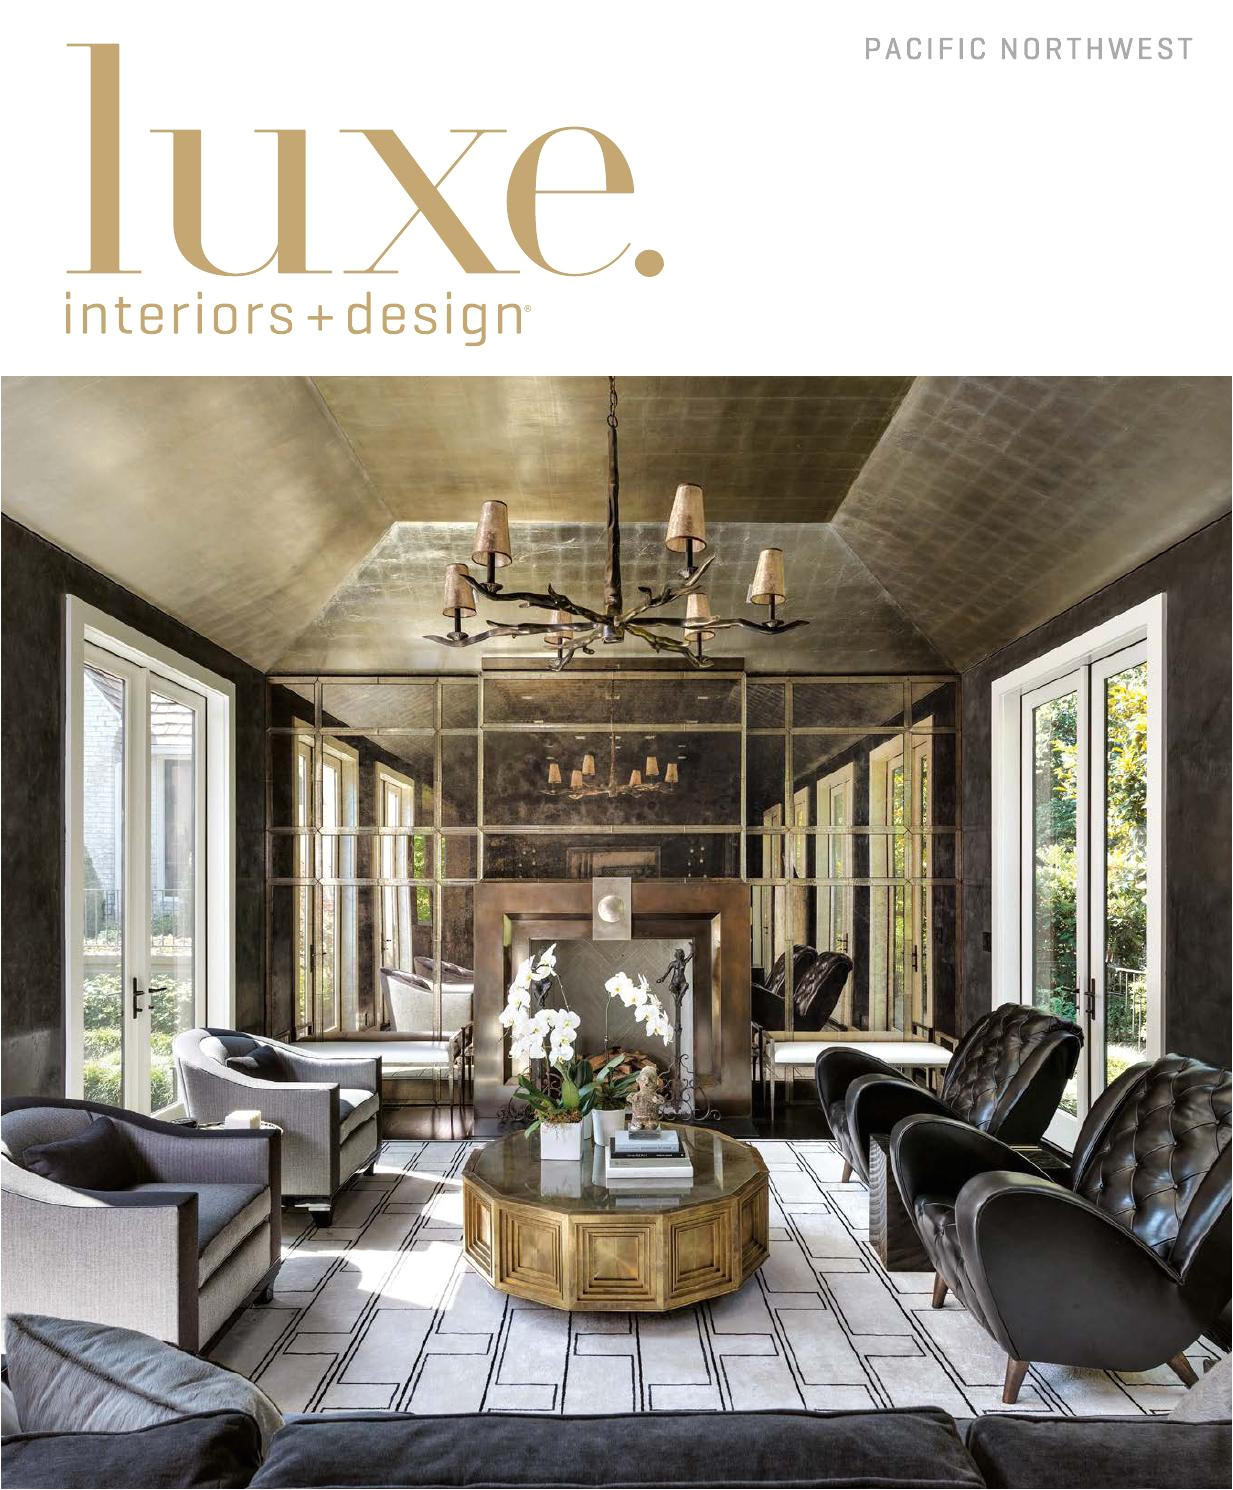 Outlet De Muebles En San Diego Luxe Magazine September 2015 Pacific northwest by Sandowa issuu